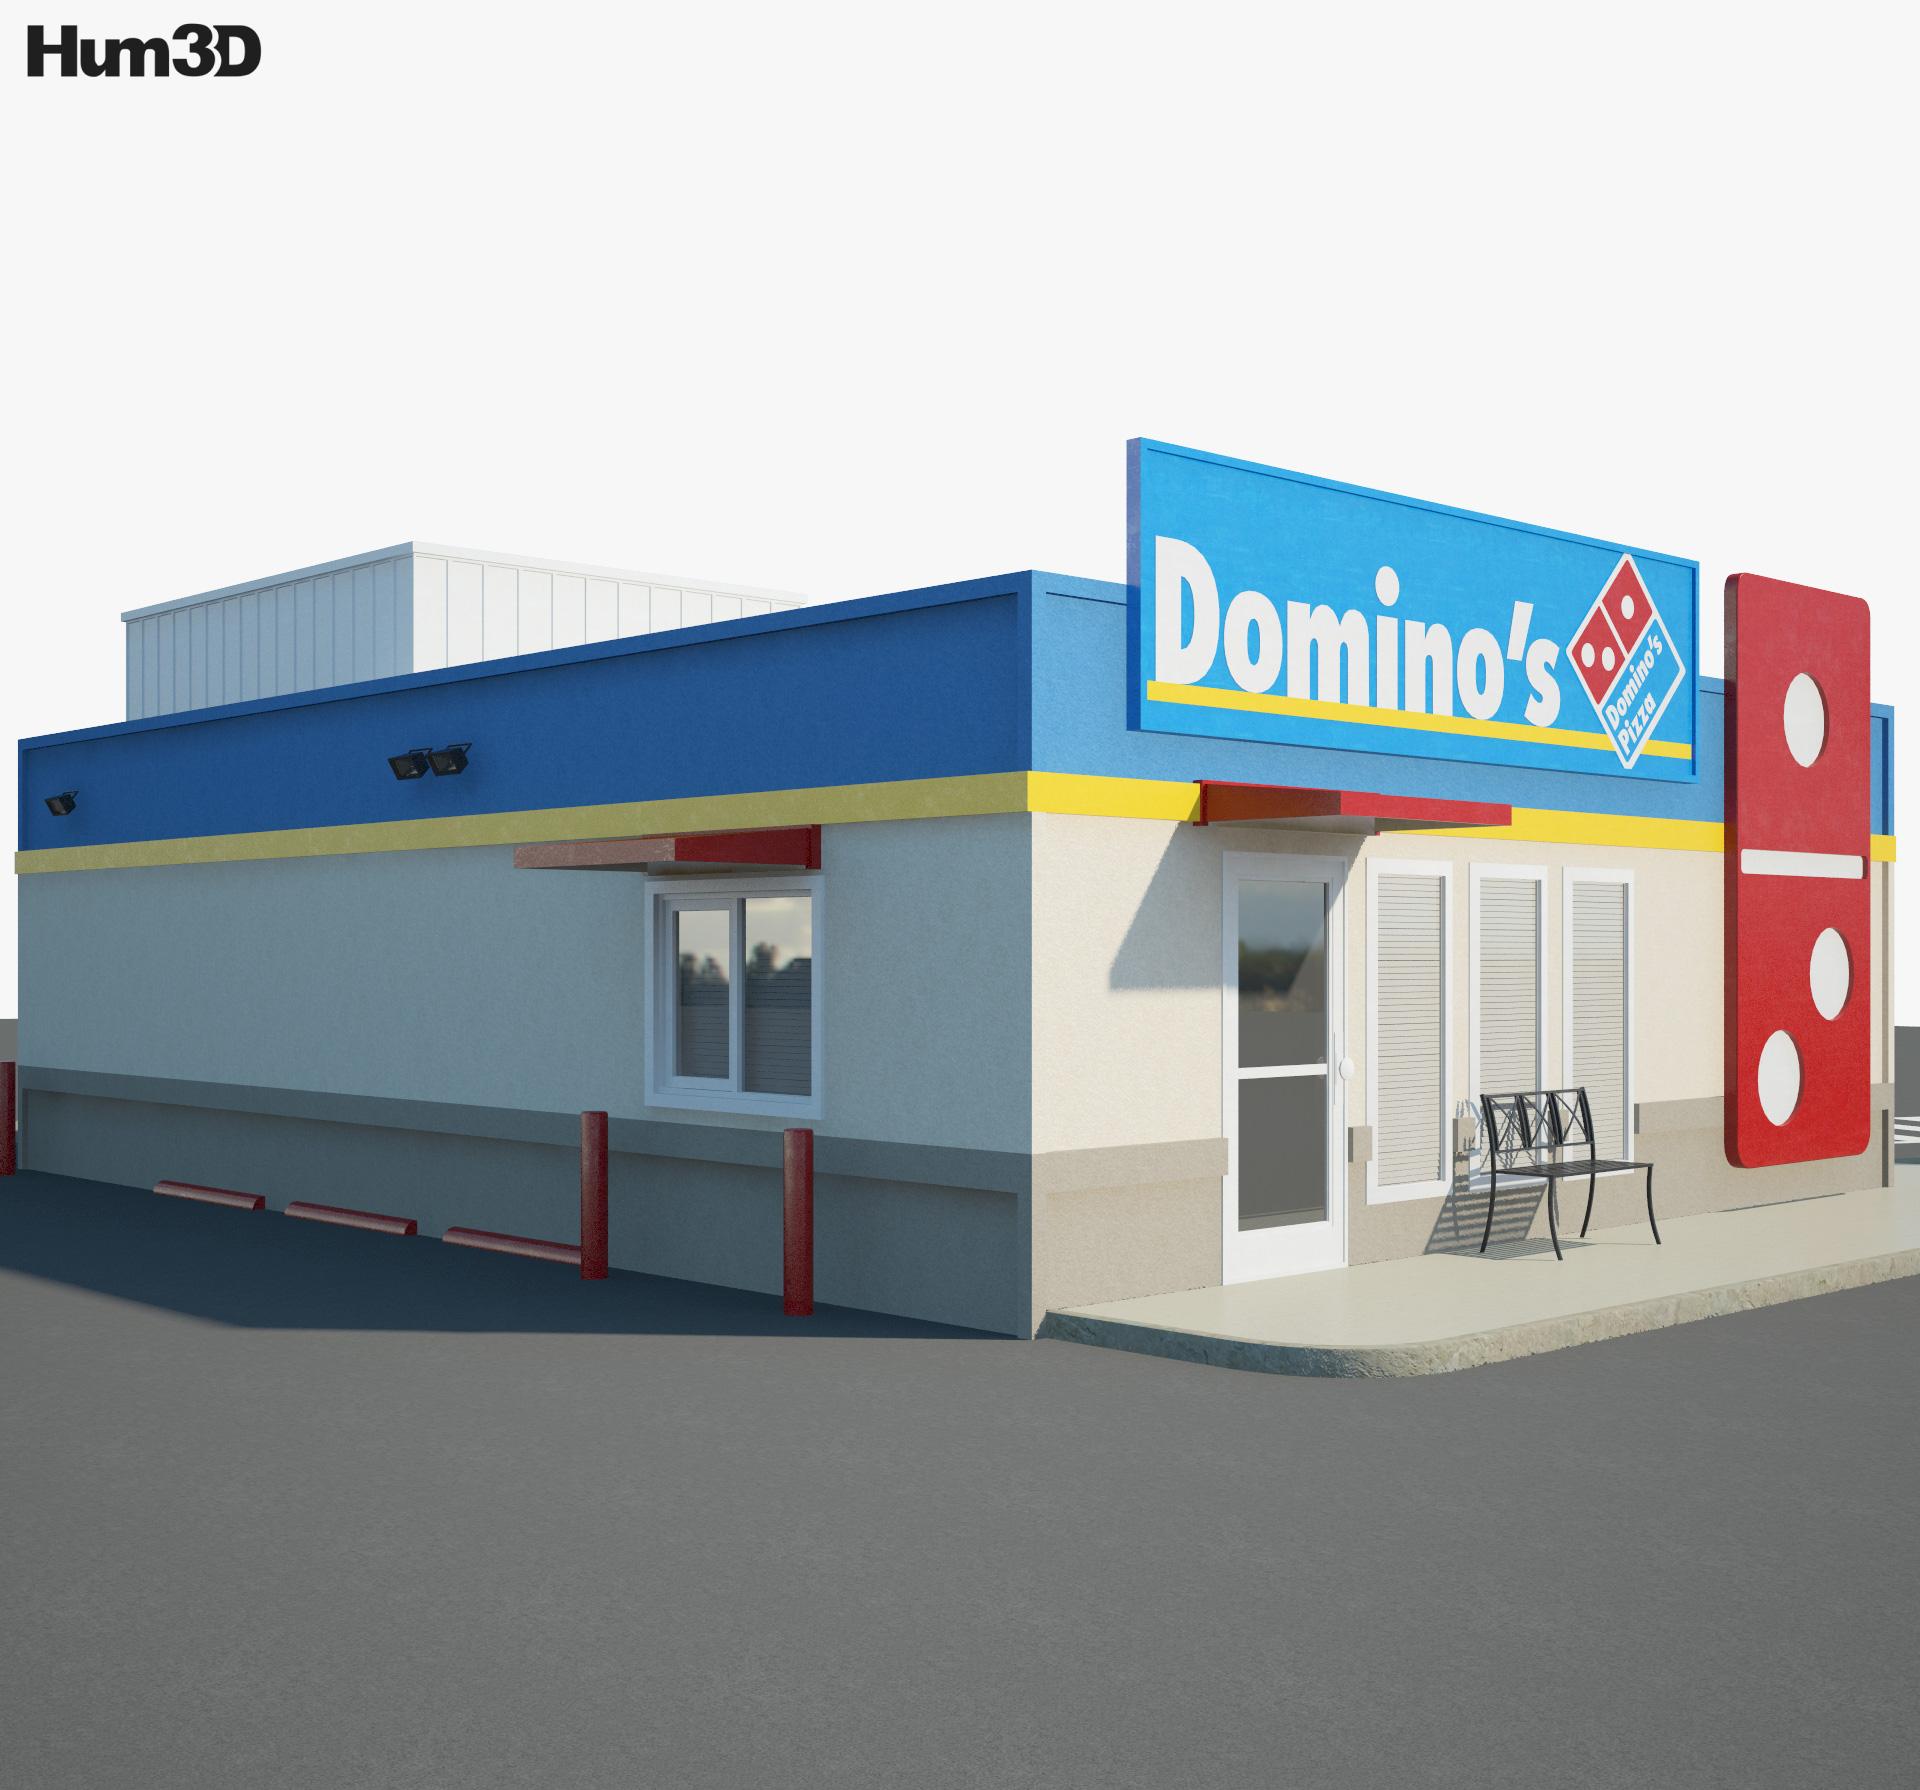 Domino's Pizza Restaurant 02 3d model